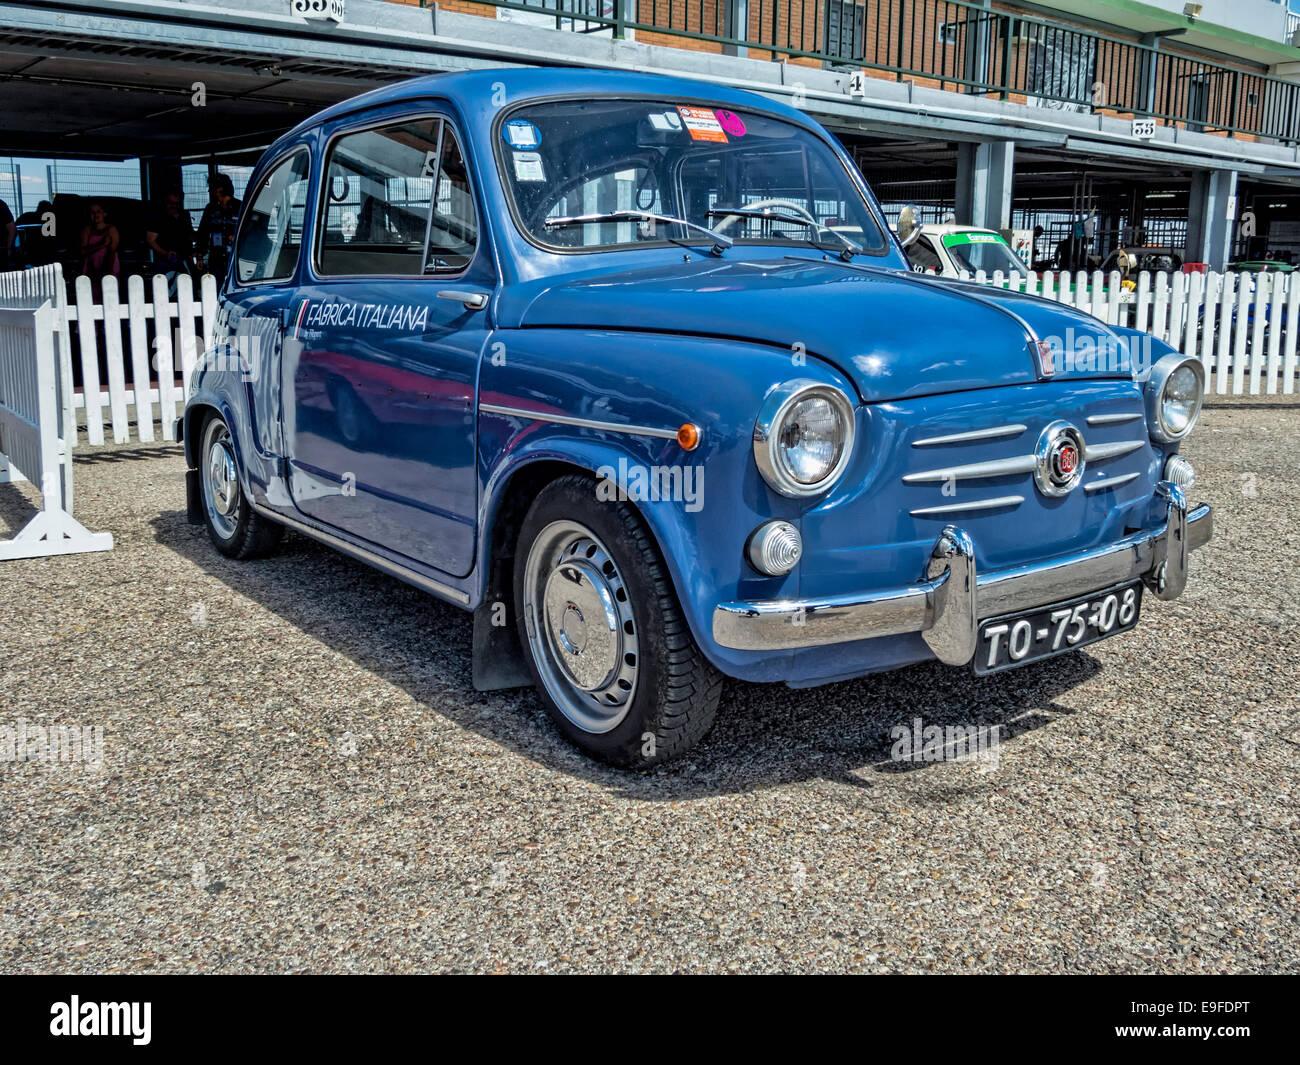 Jarama, Madrid, Spain. 07 - June:  The city car Fiat 600 Seicento - Stock Image